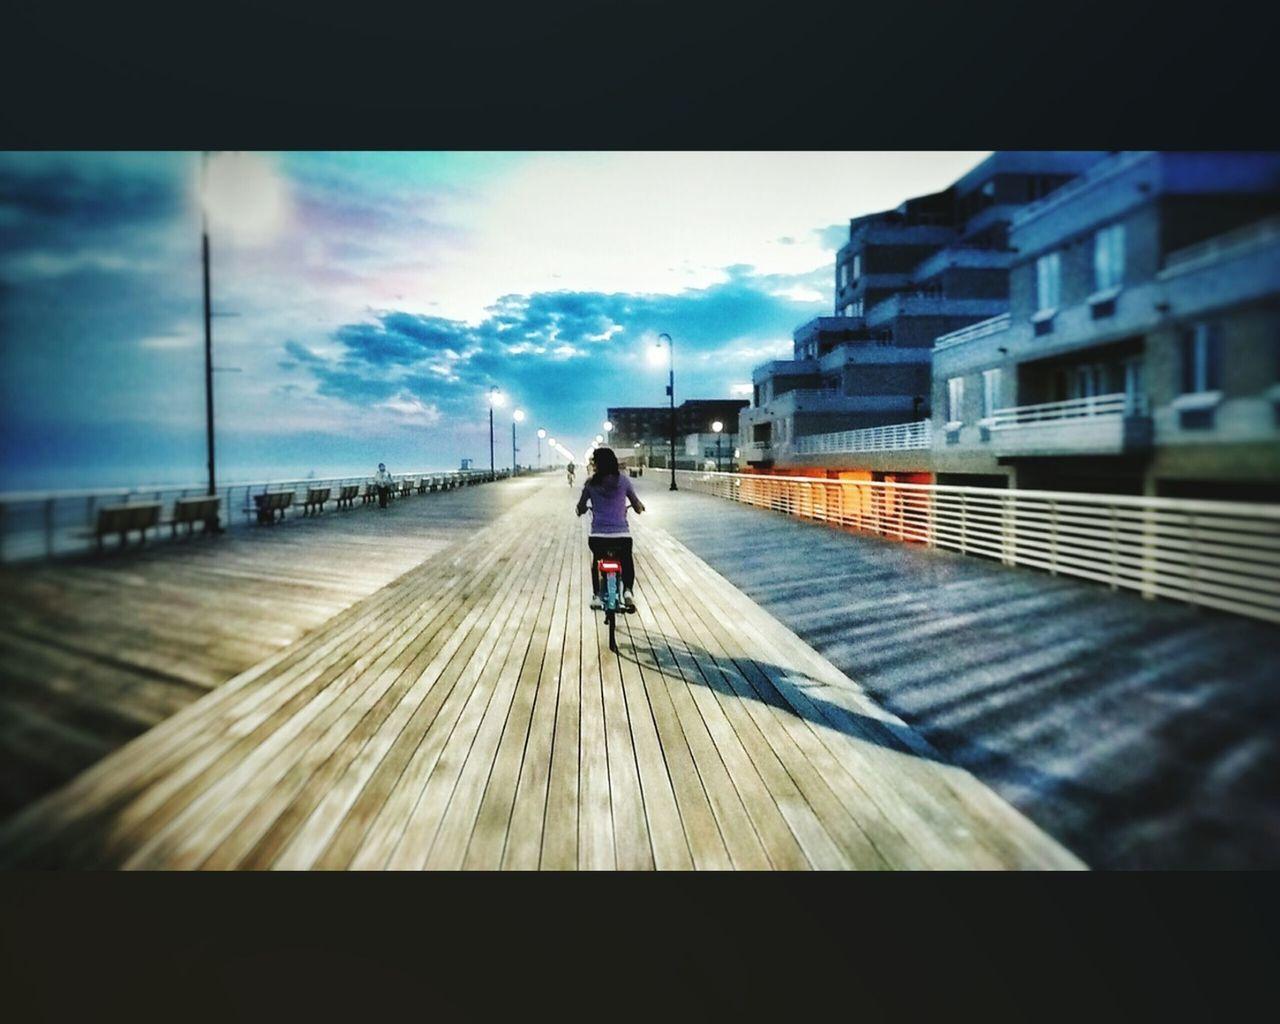 The Street Photographer - 2015 EyeEm Awards Check This Out Atriumtakitowncenter Atrıumtakitowncenter Atrıumtakıtowncenter Atriumtakıtowncenter Atrıum Istanbuldayasam The Week Of Eyeem Turkeyphotooftheday